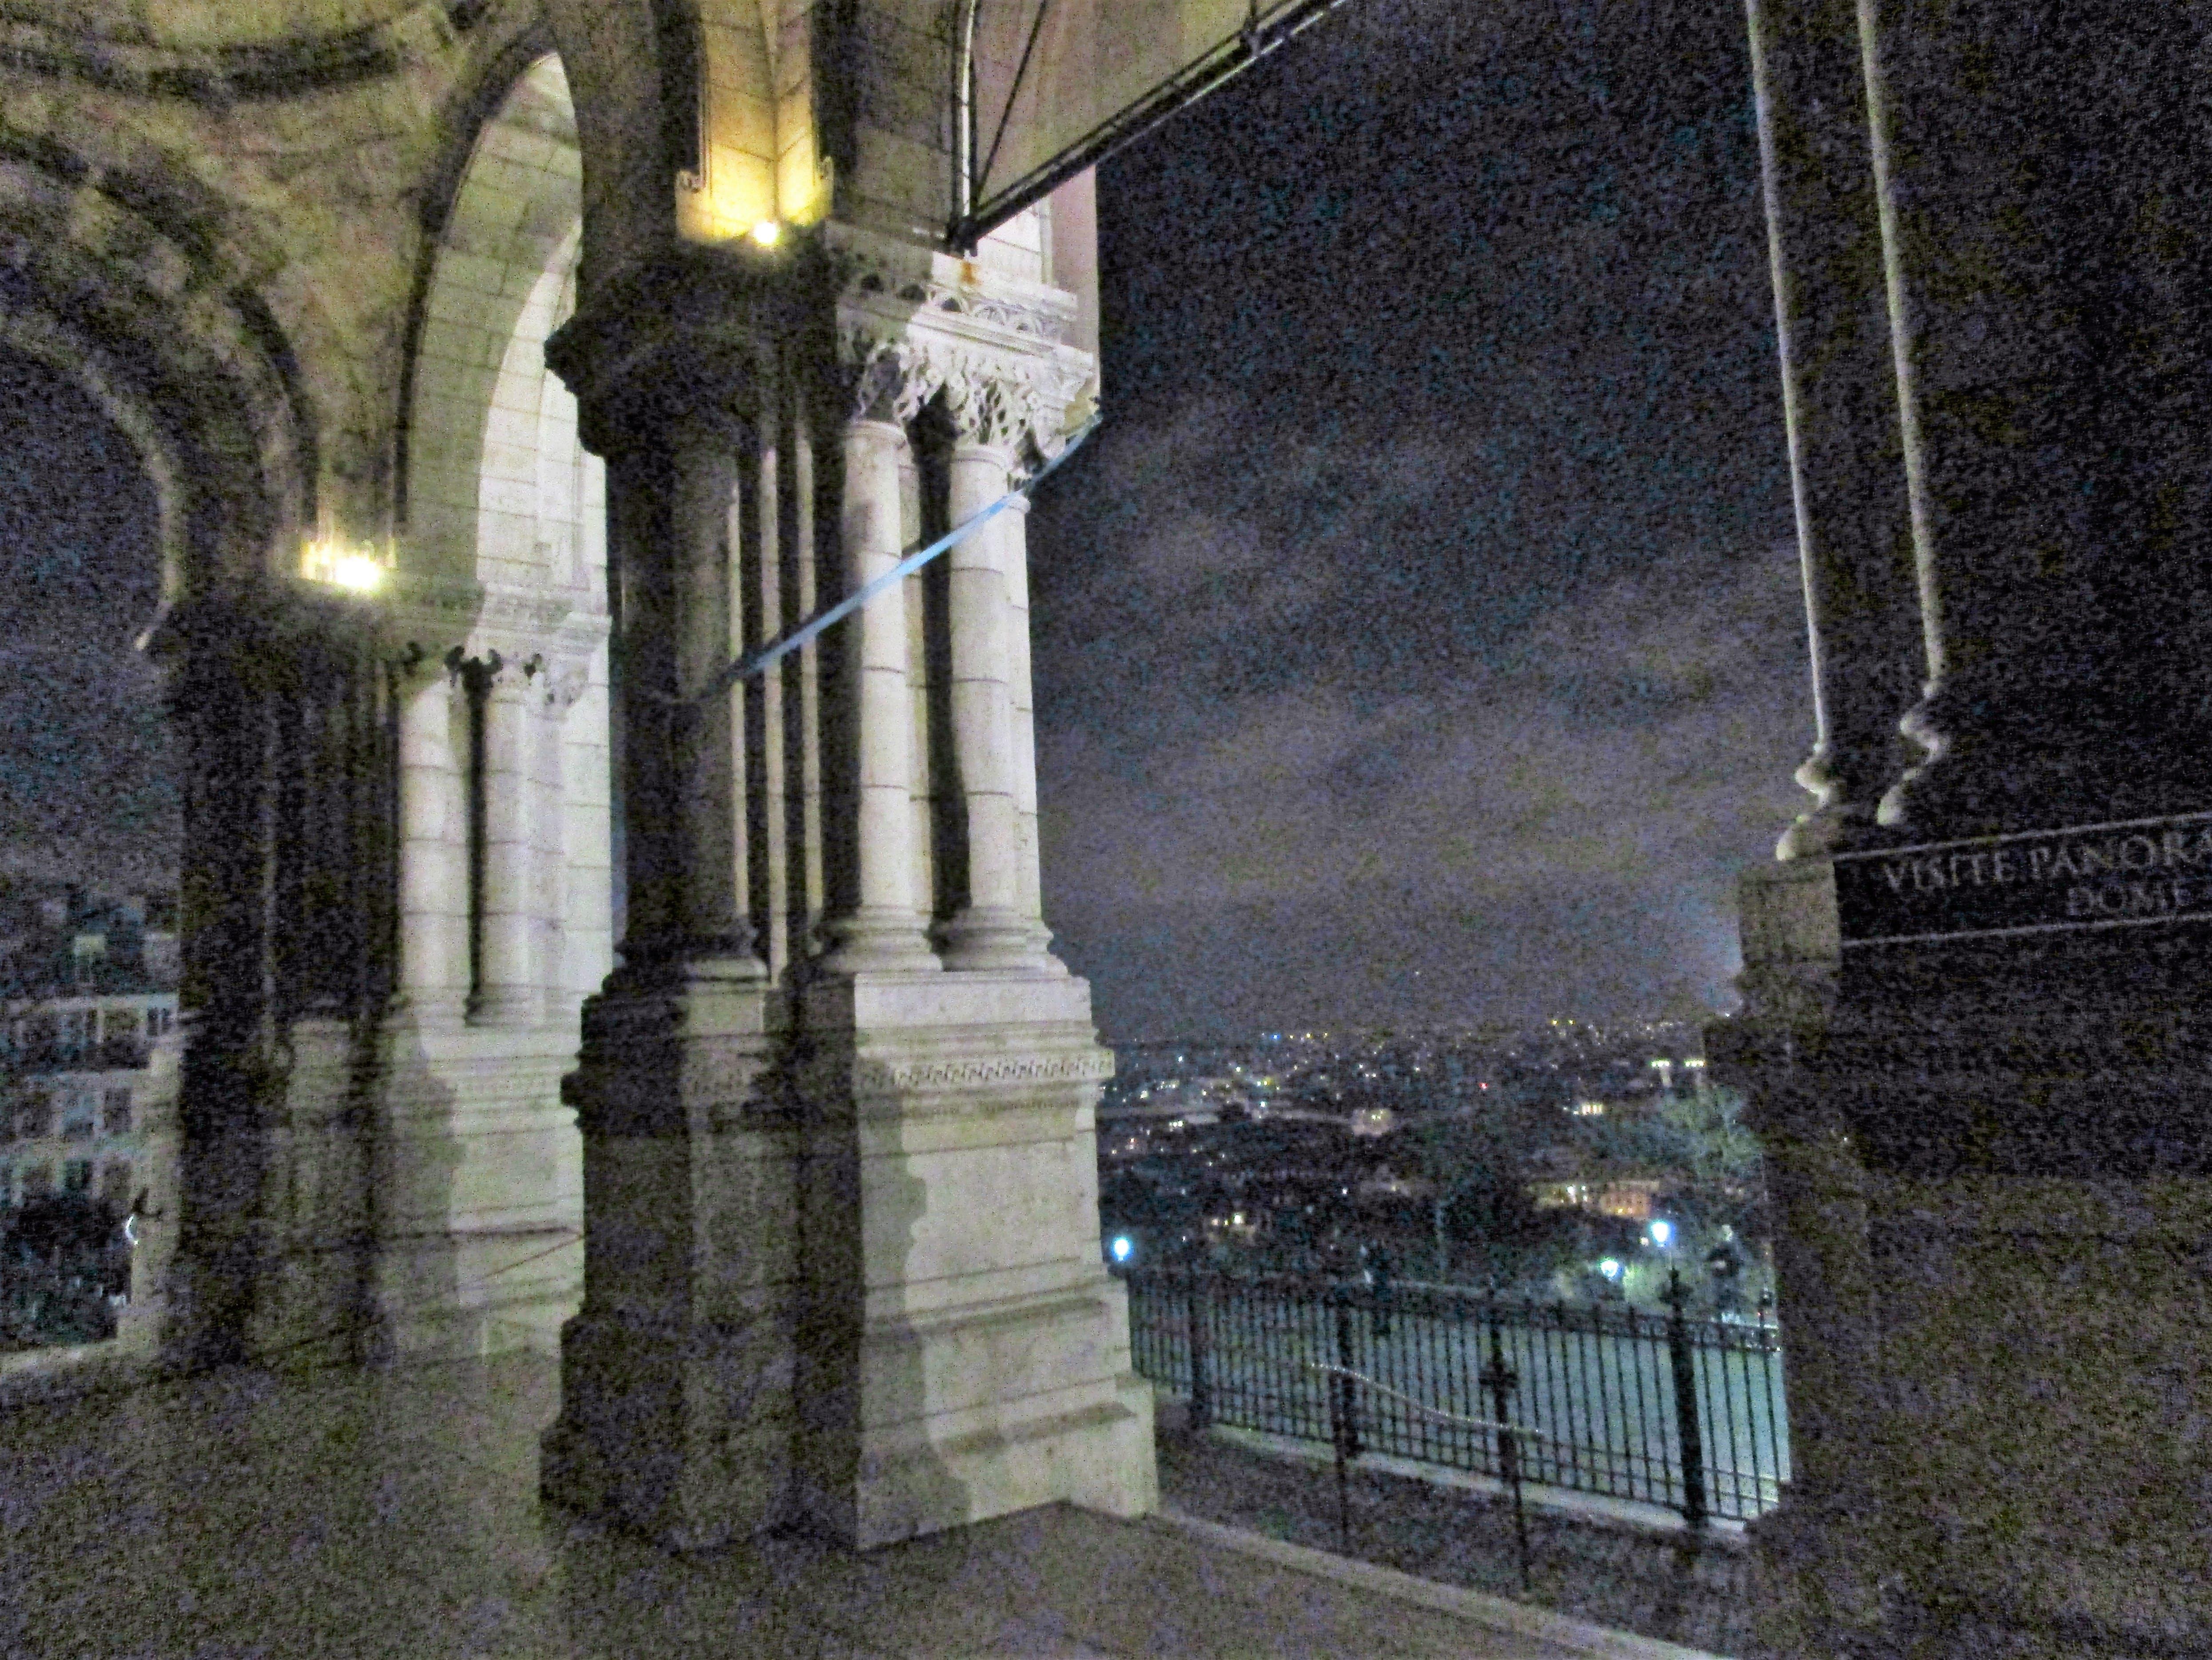 Free stock photo of the Sacré-Cœur Basilica